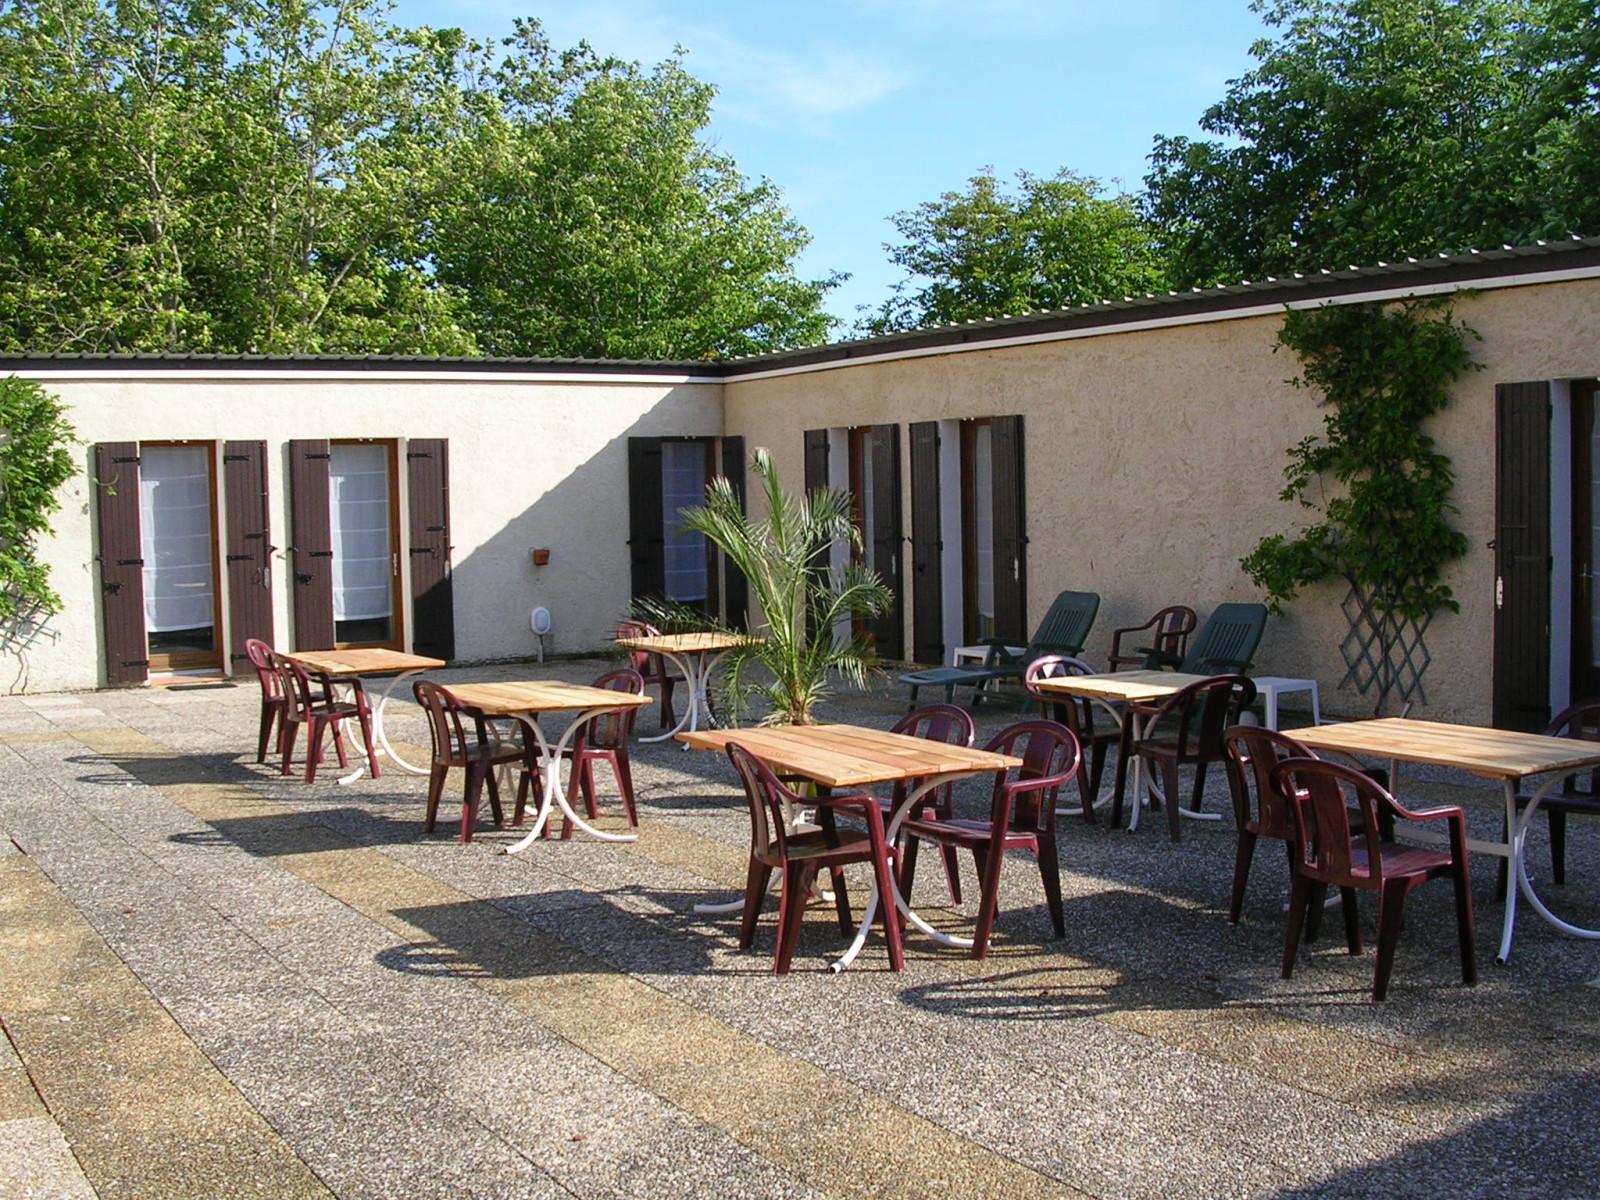 Saint-Bonnet-en-ChampsaurN3874.jpg